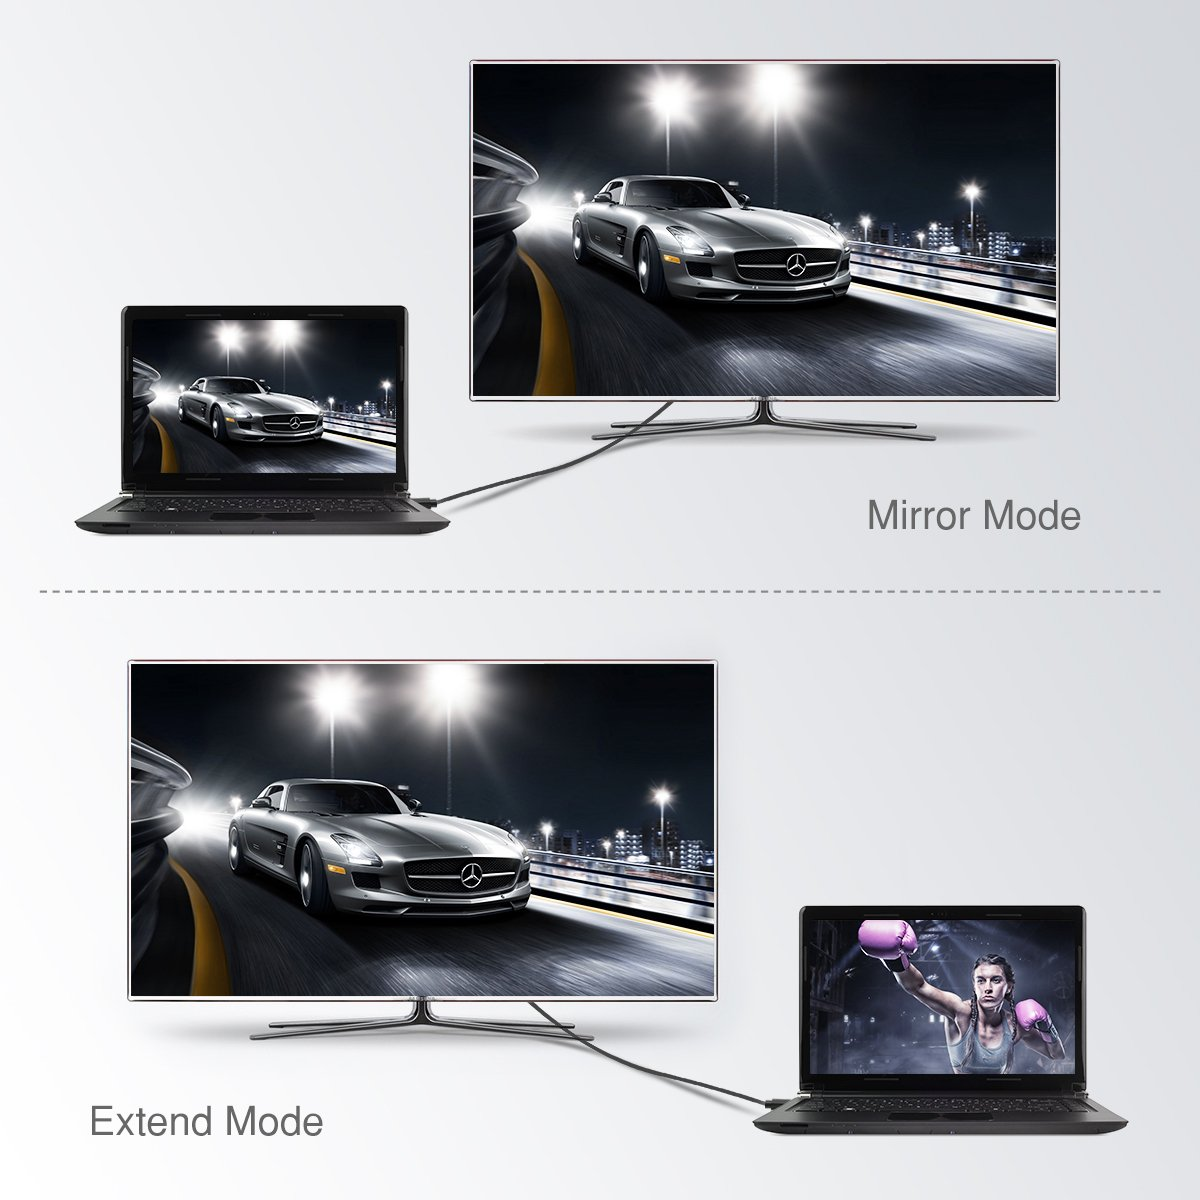 Pleated Micro Glass Media HY-PRO MN-HP290L103MV Direct Interchange for HY-PRO-HP290L103MV